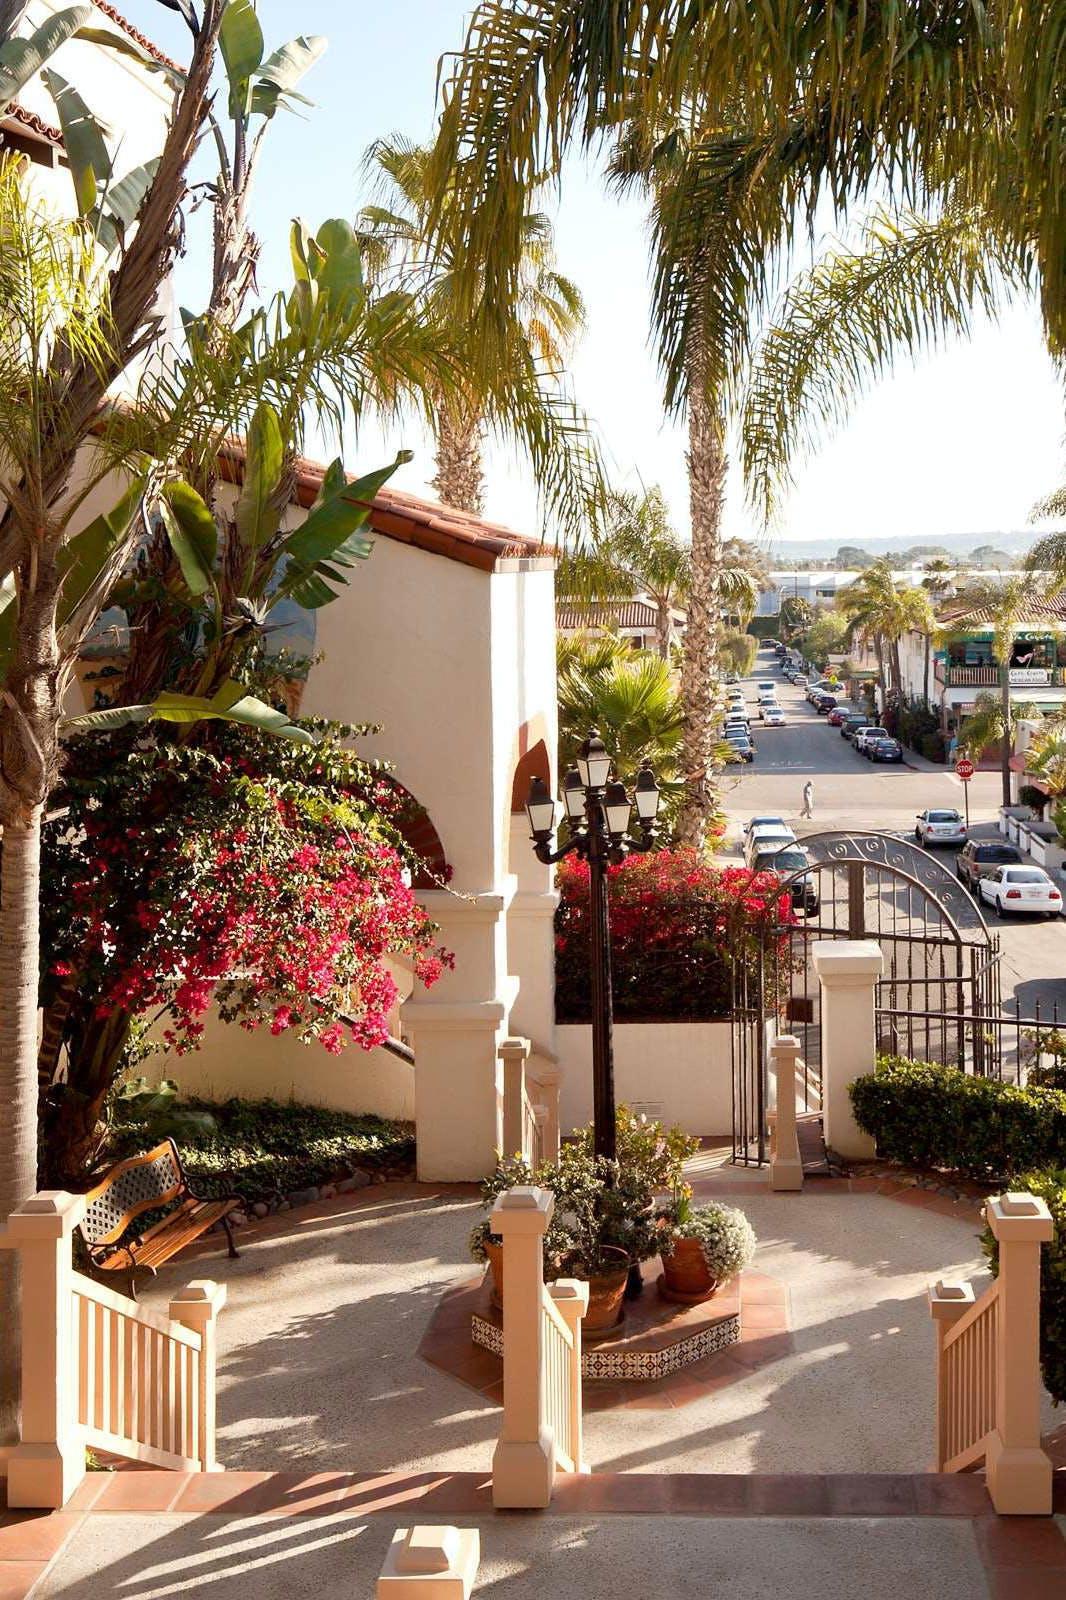 Best Western Plus Hacienda Hotel Old Town